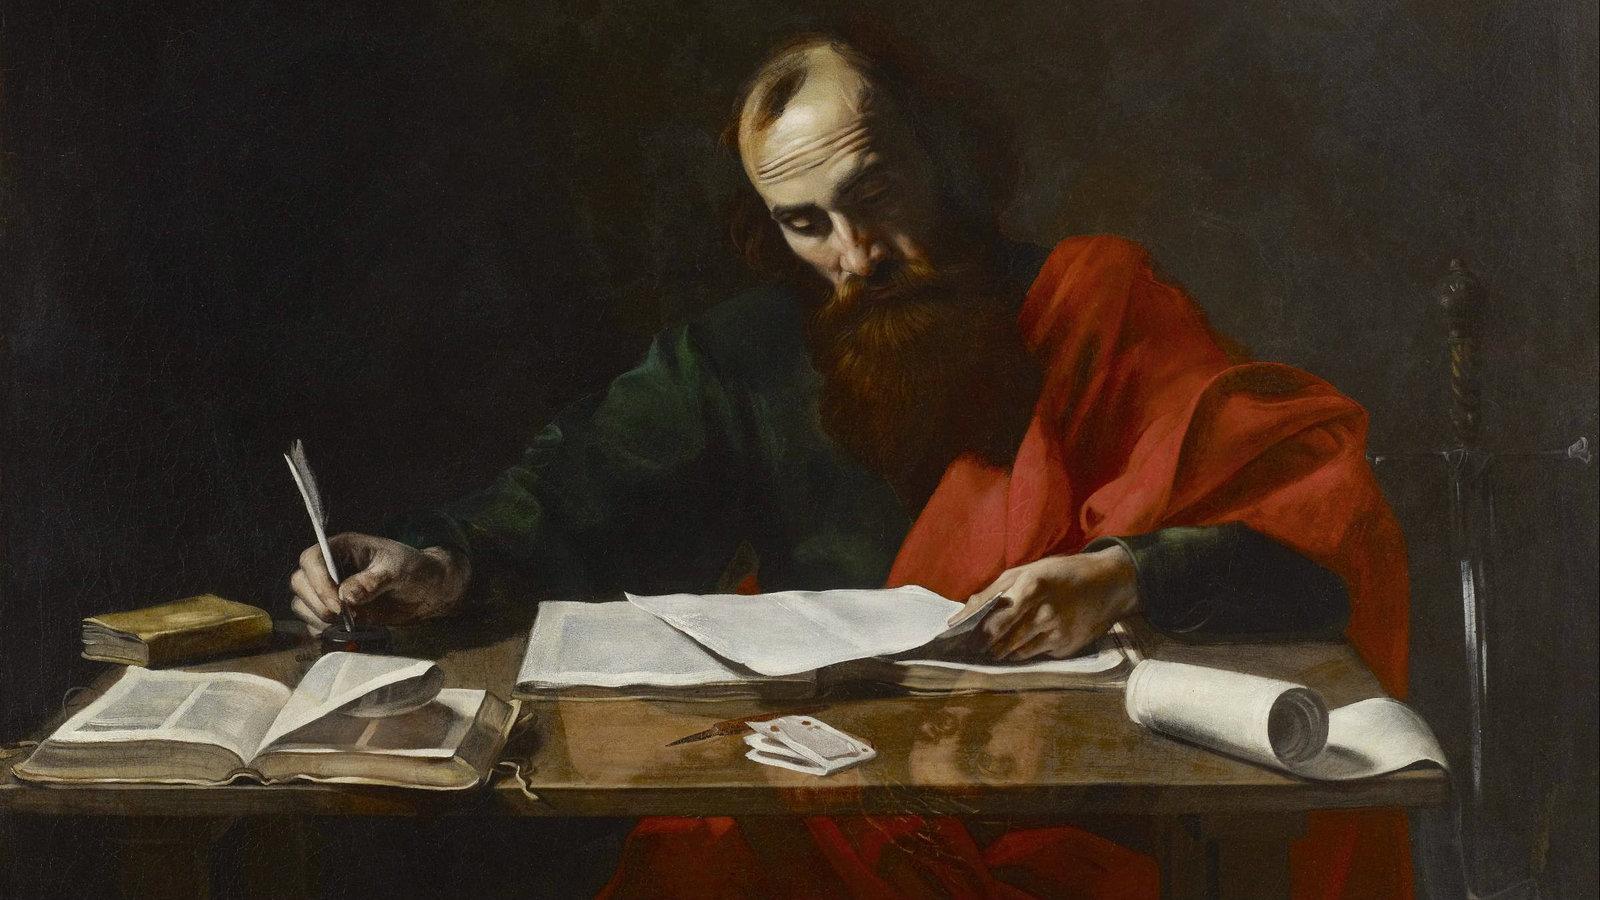 The Apostle Paul Writing Books